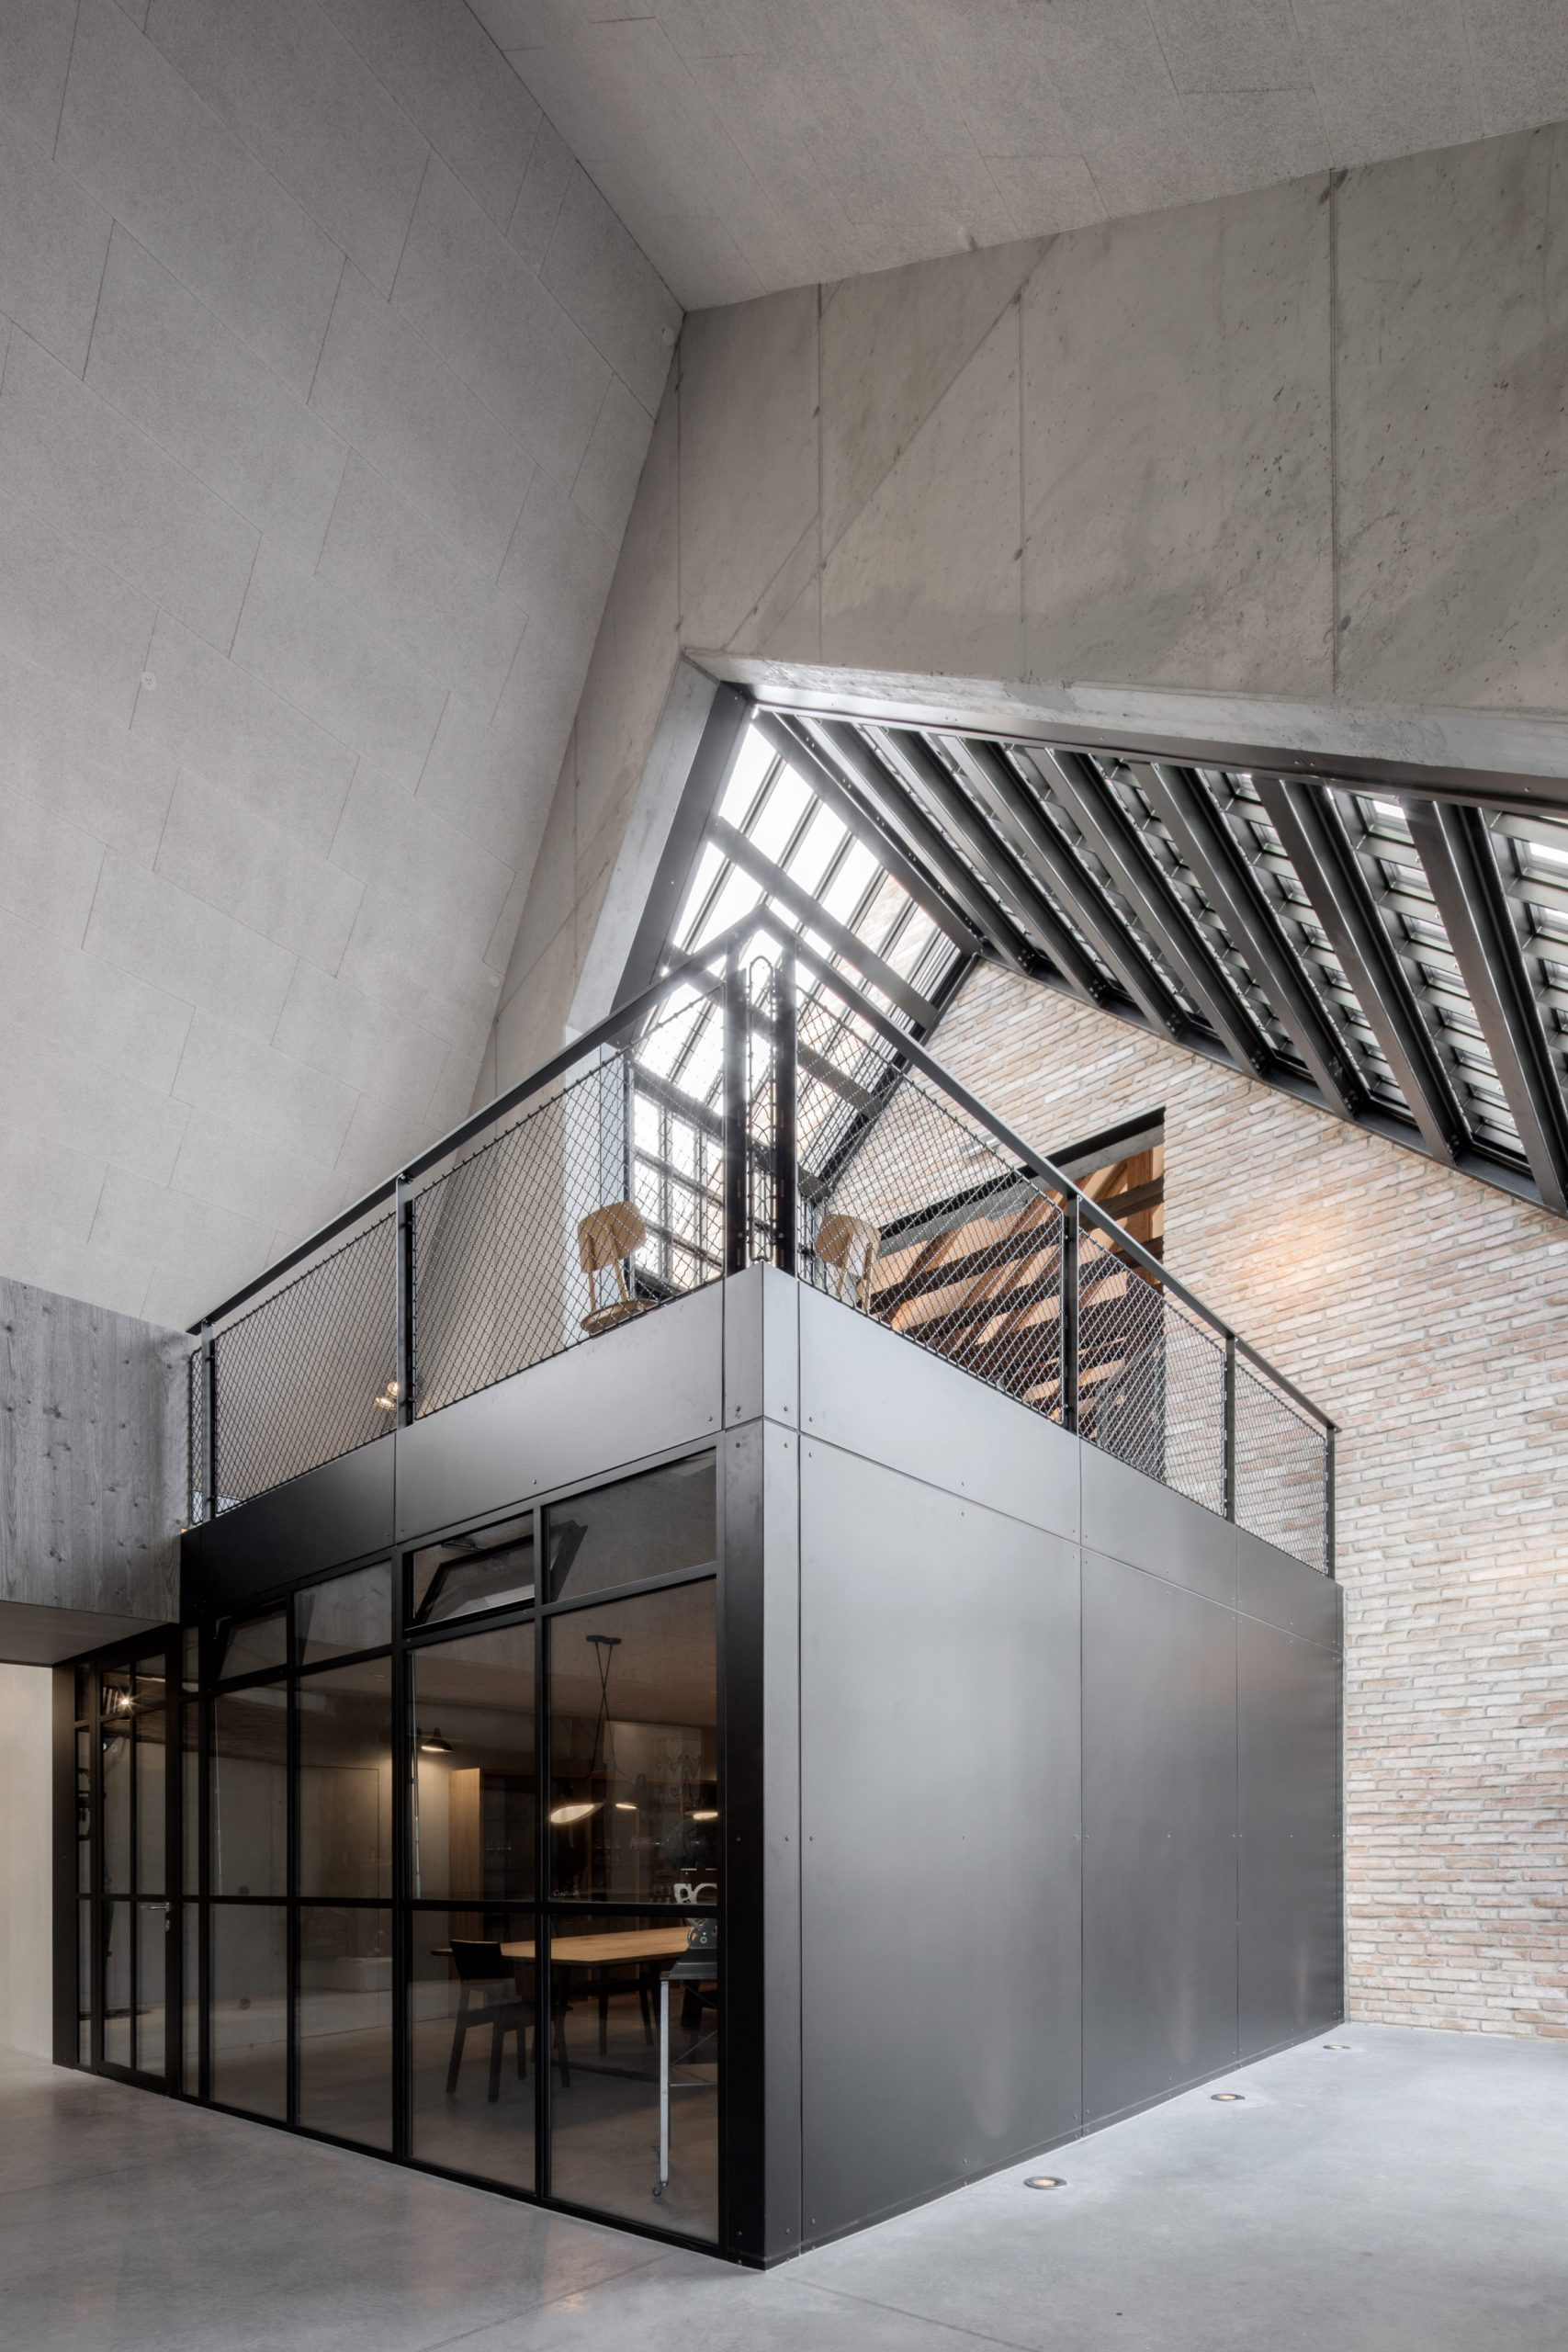 Grey Shades Permeate Interiors Of Austria S Clemens Strobl Winery New Urbanism Blog